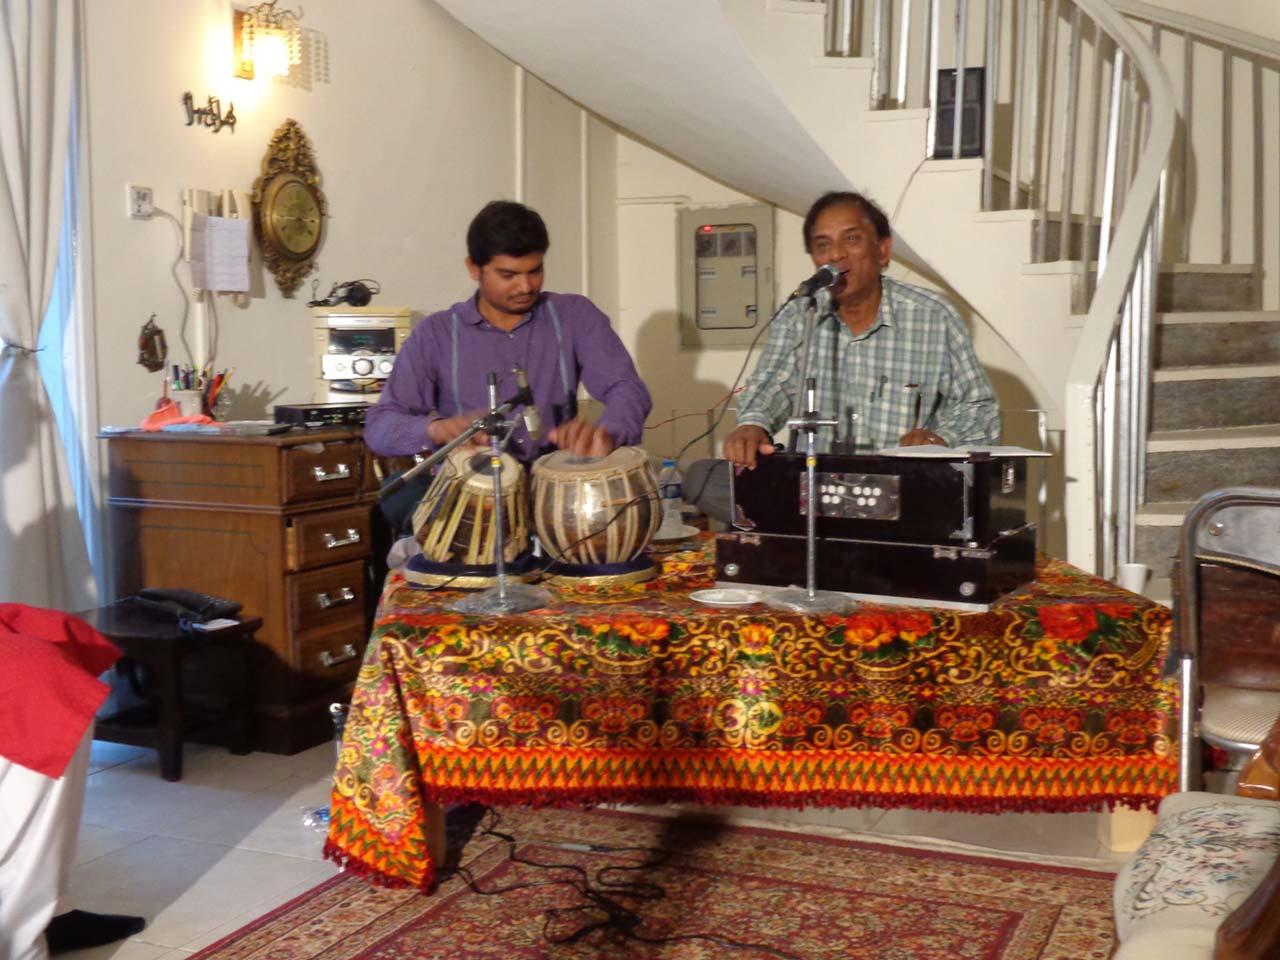 Almas Arif and Khalil Qureshi